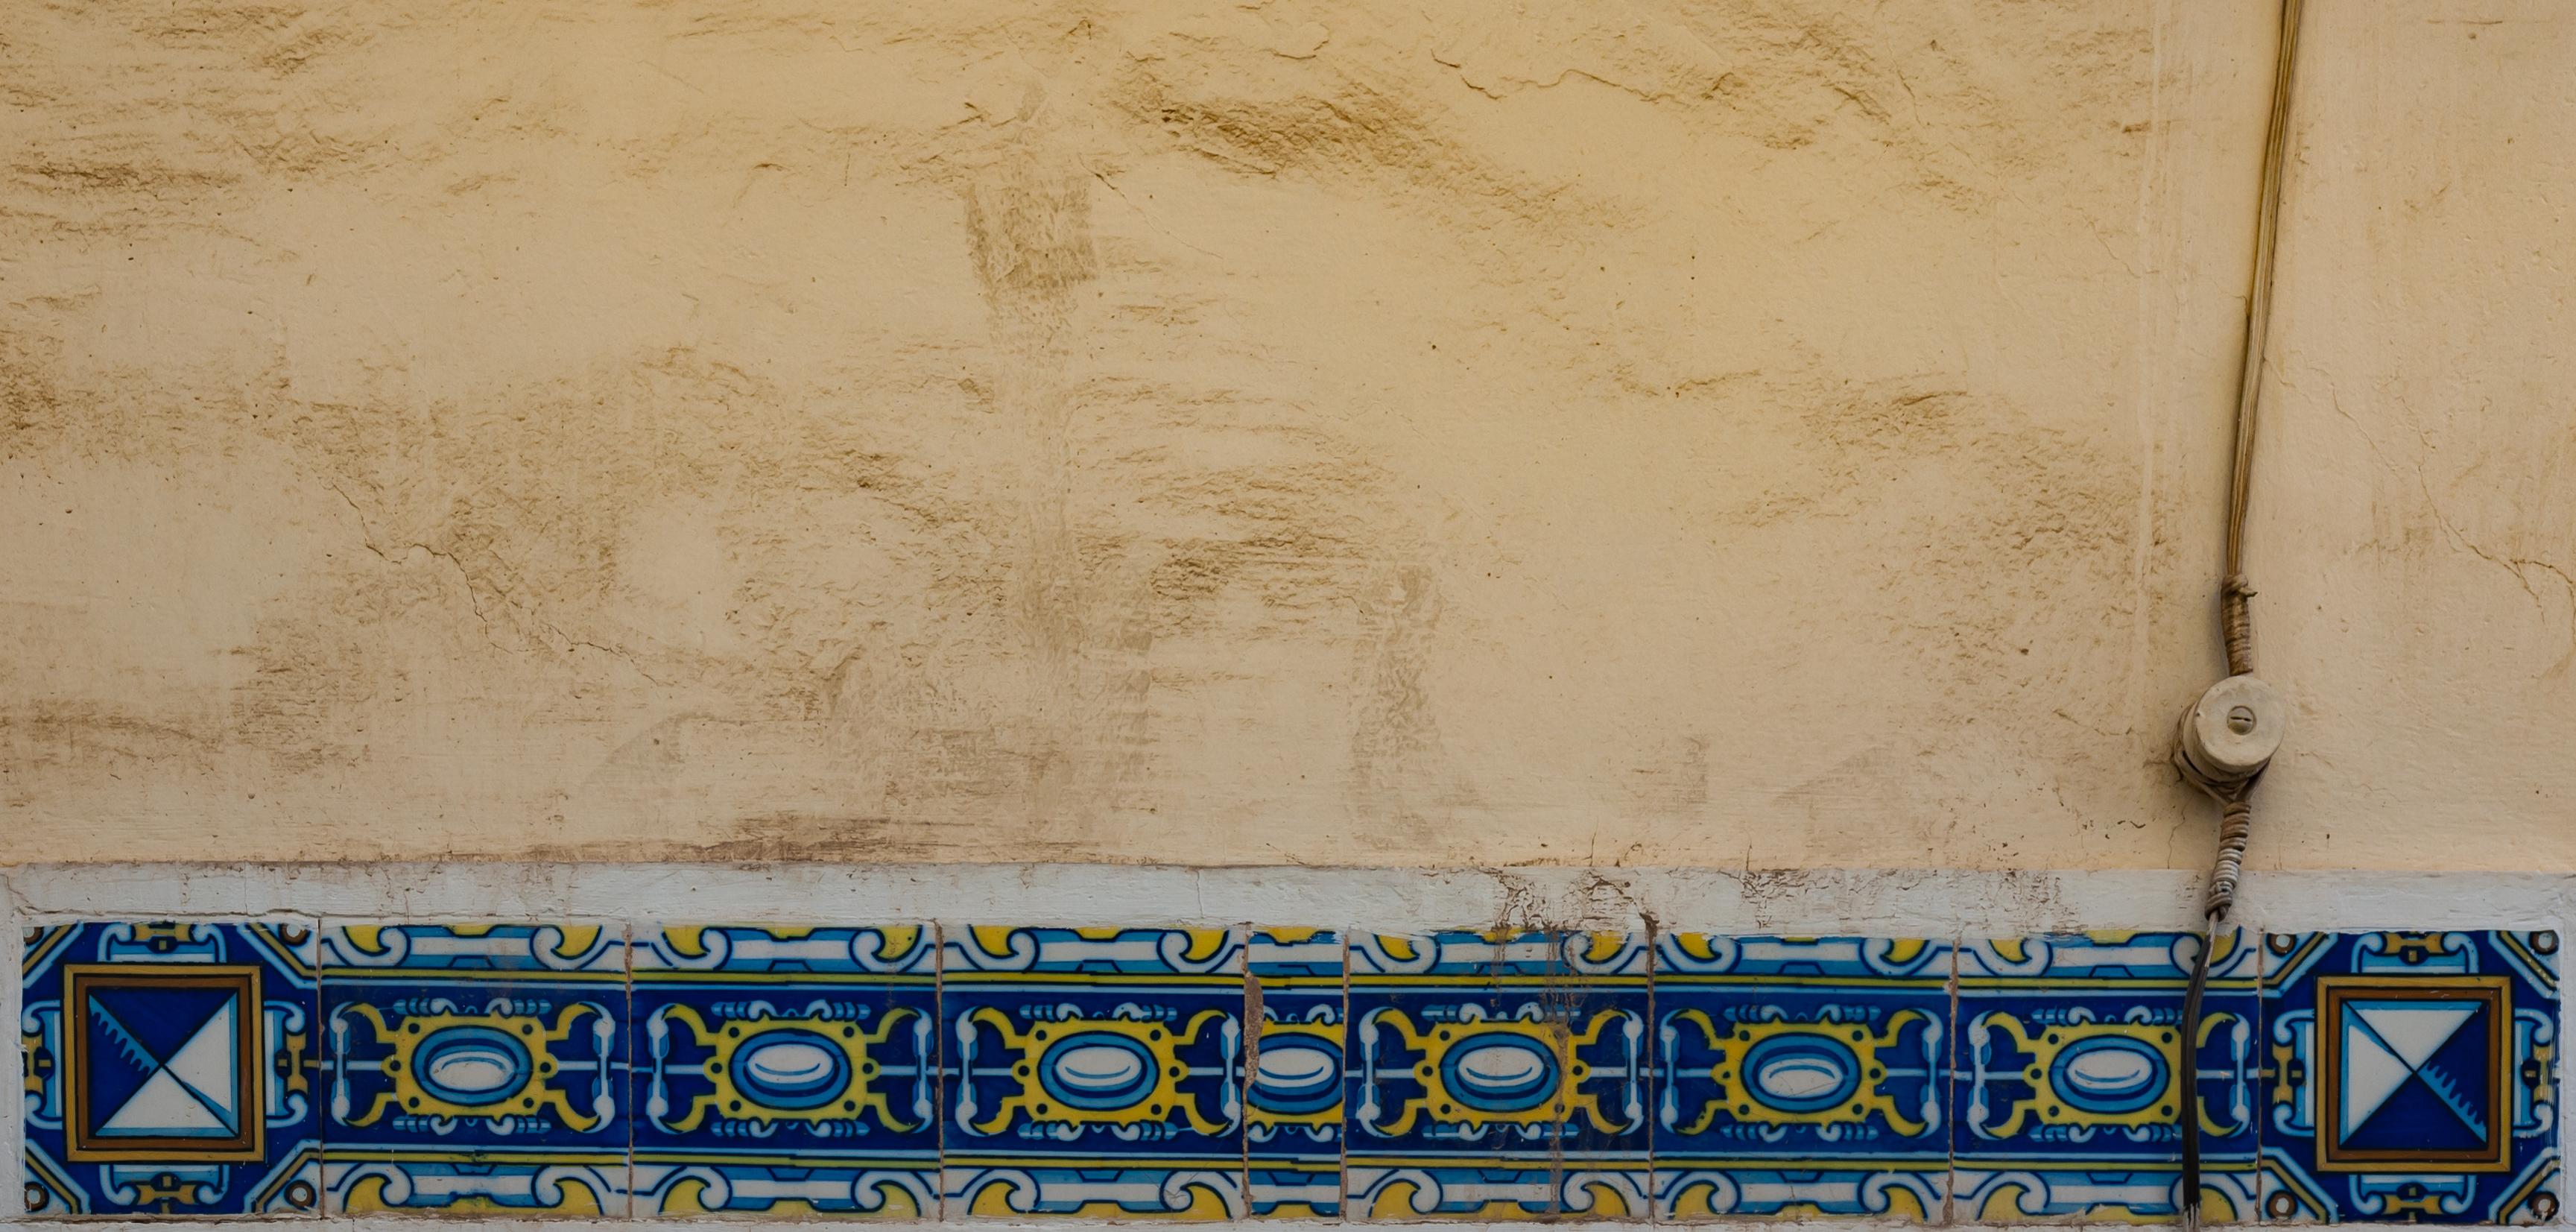 File:Córdoba Spain Decorative-tiles-in-Calle-San Fernando-01.jpg ...